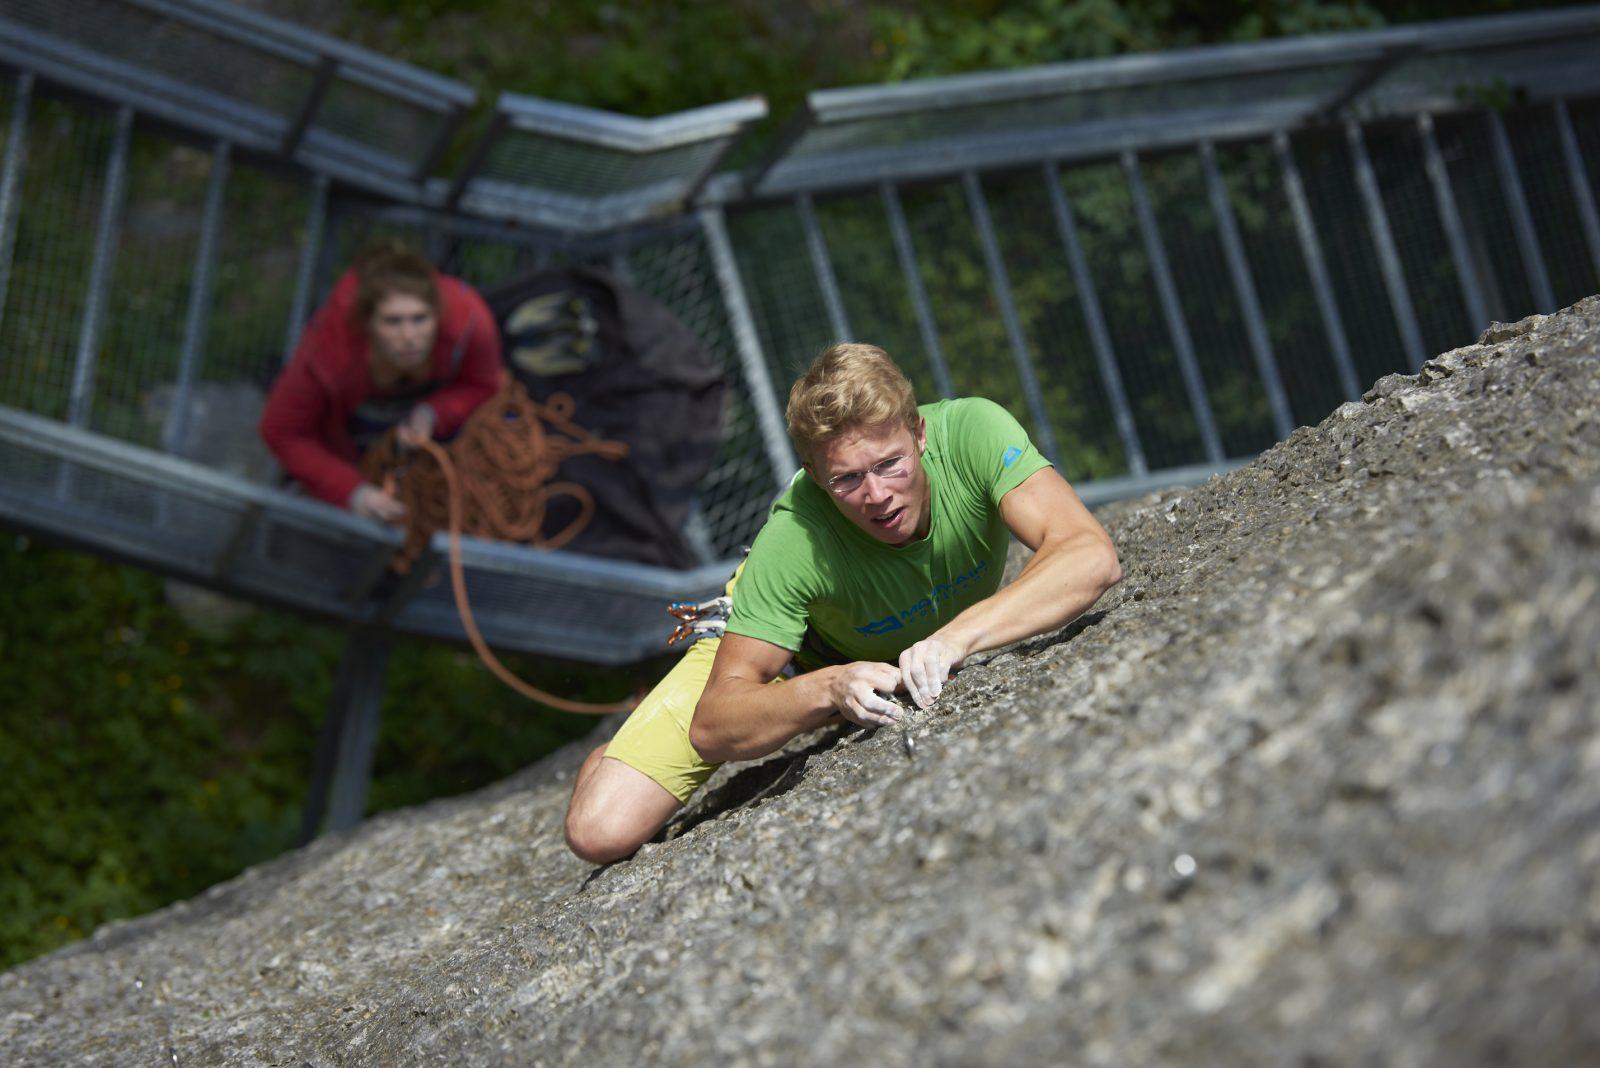 Sportklettern in der Schnanner Klamm bei St. Anton am Arlberg. Foto: Michael Meisl | Climbers Paradise